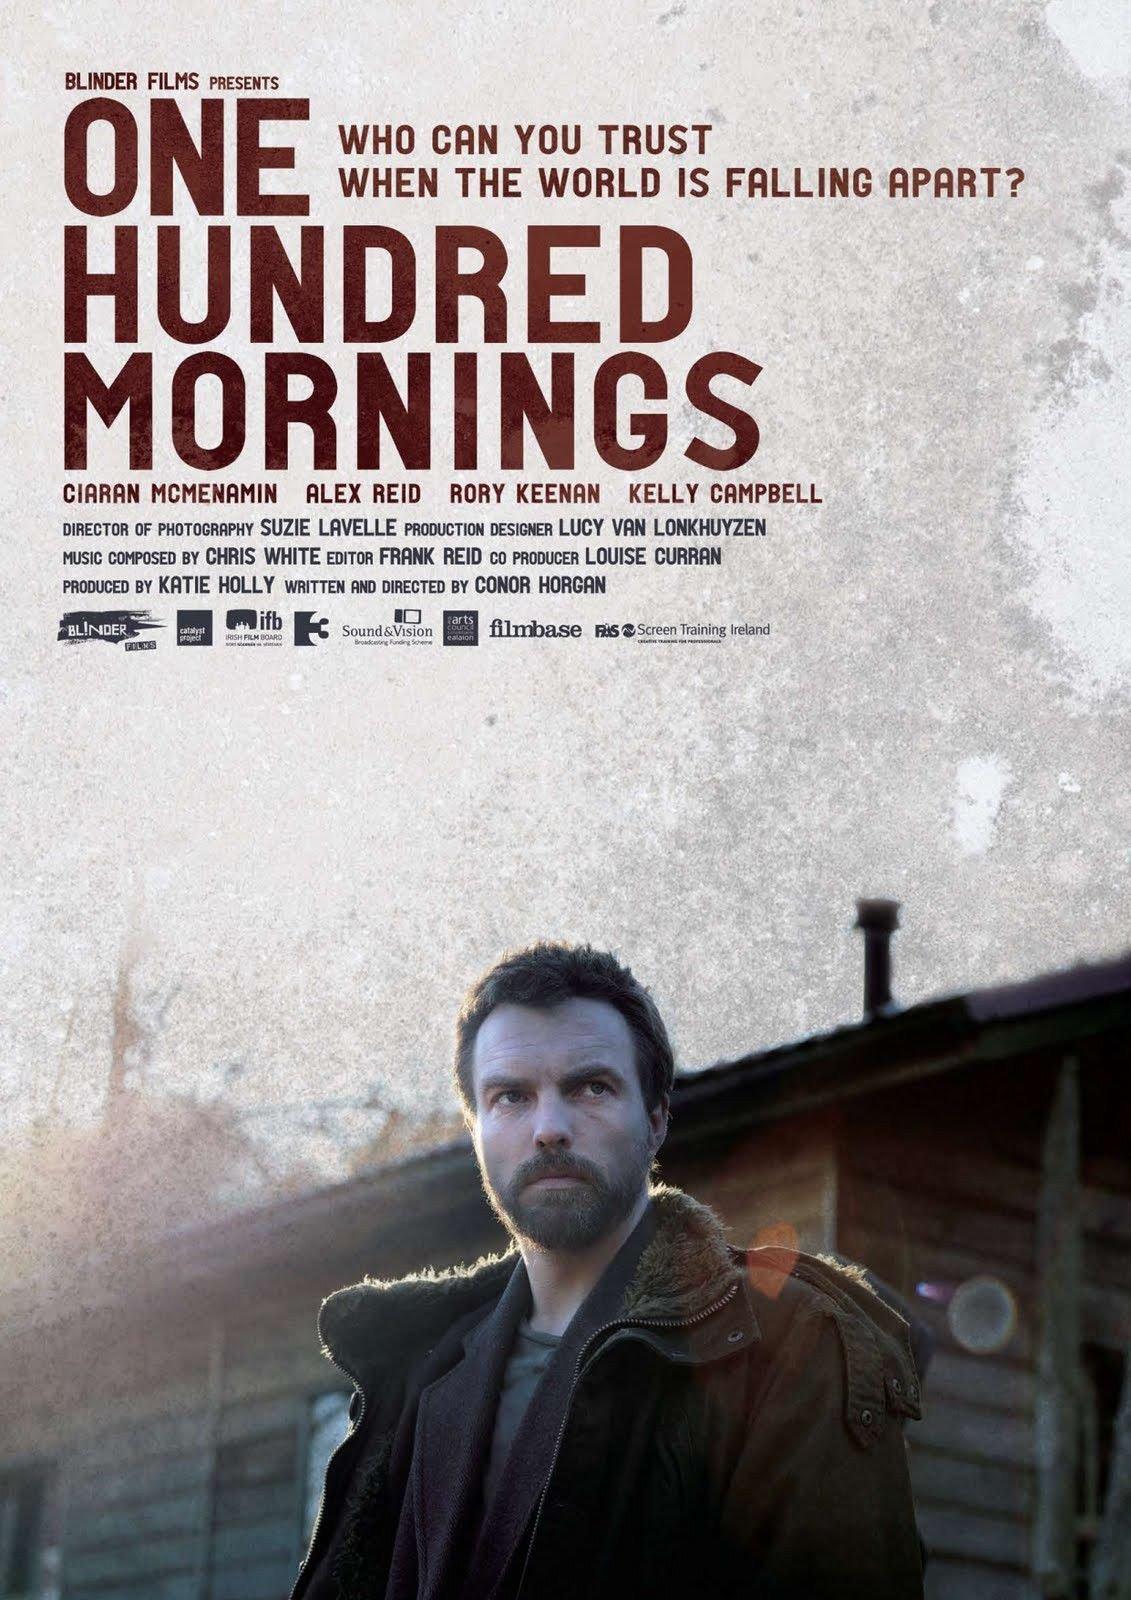 IIFF 2010: One Hundred Mornings